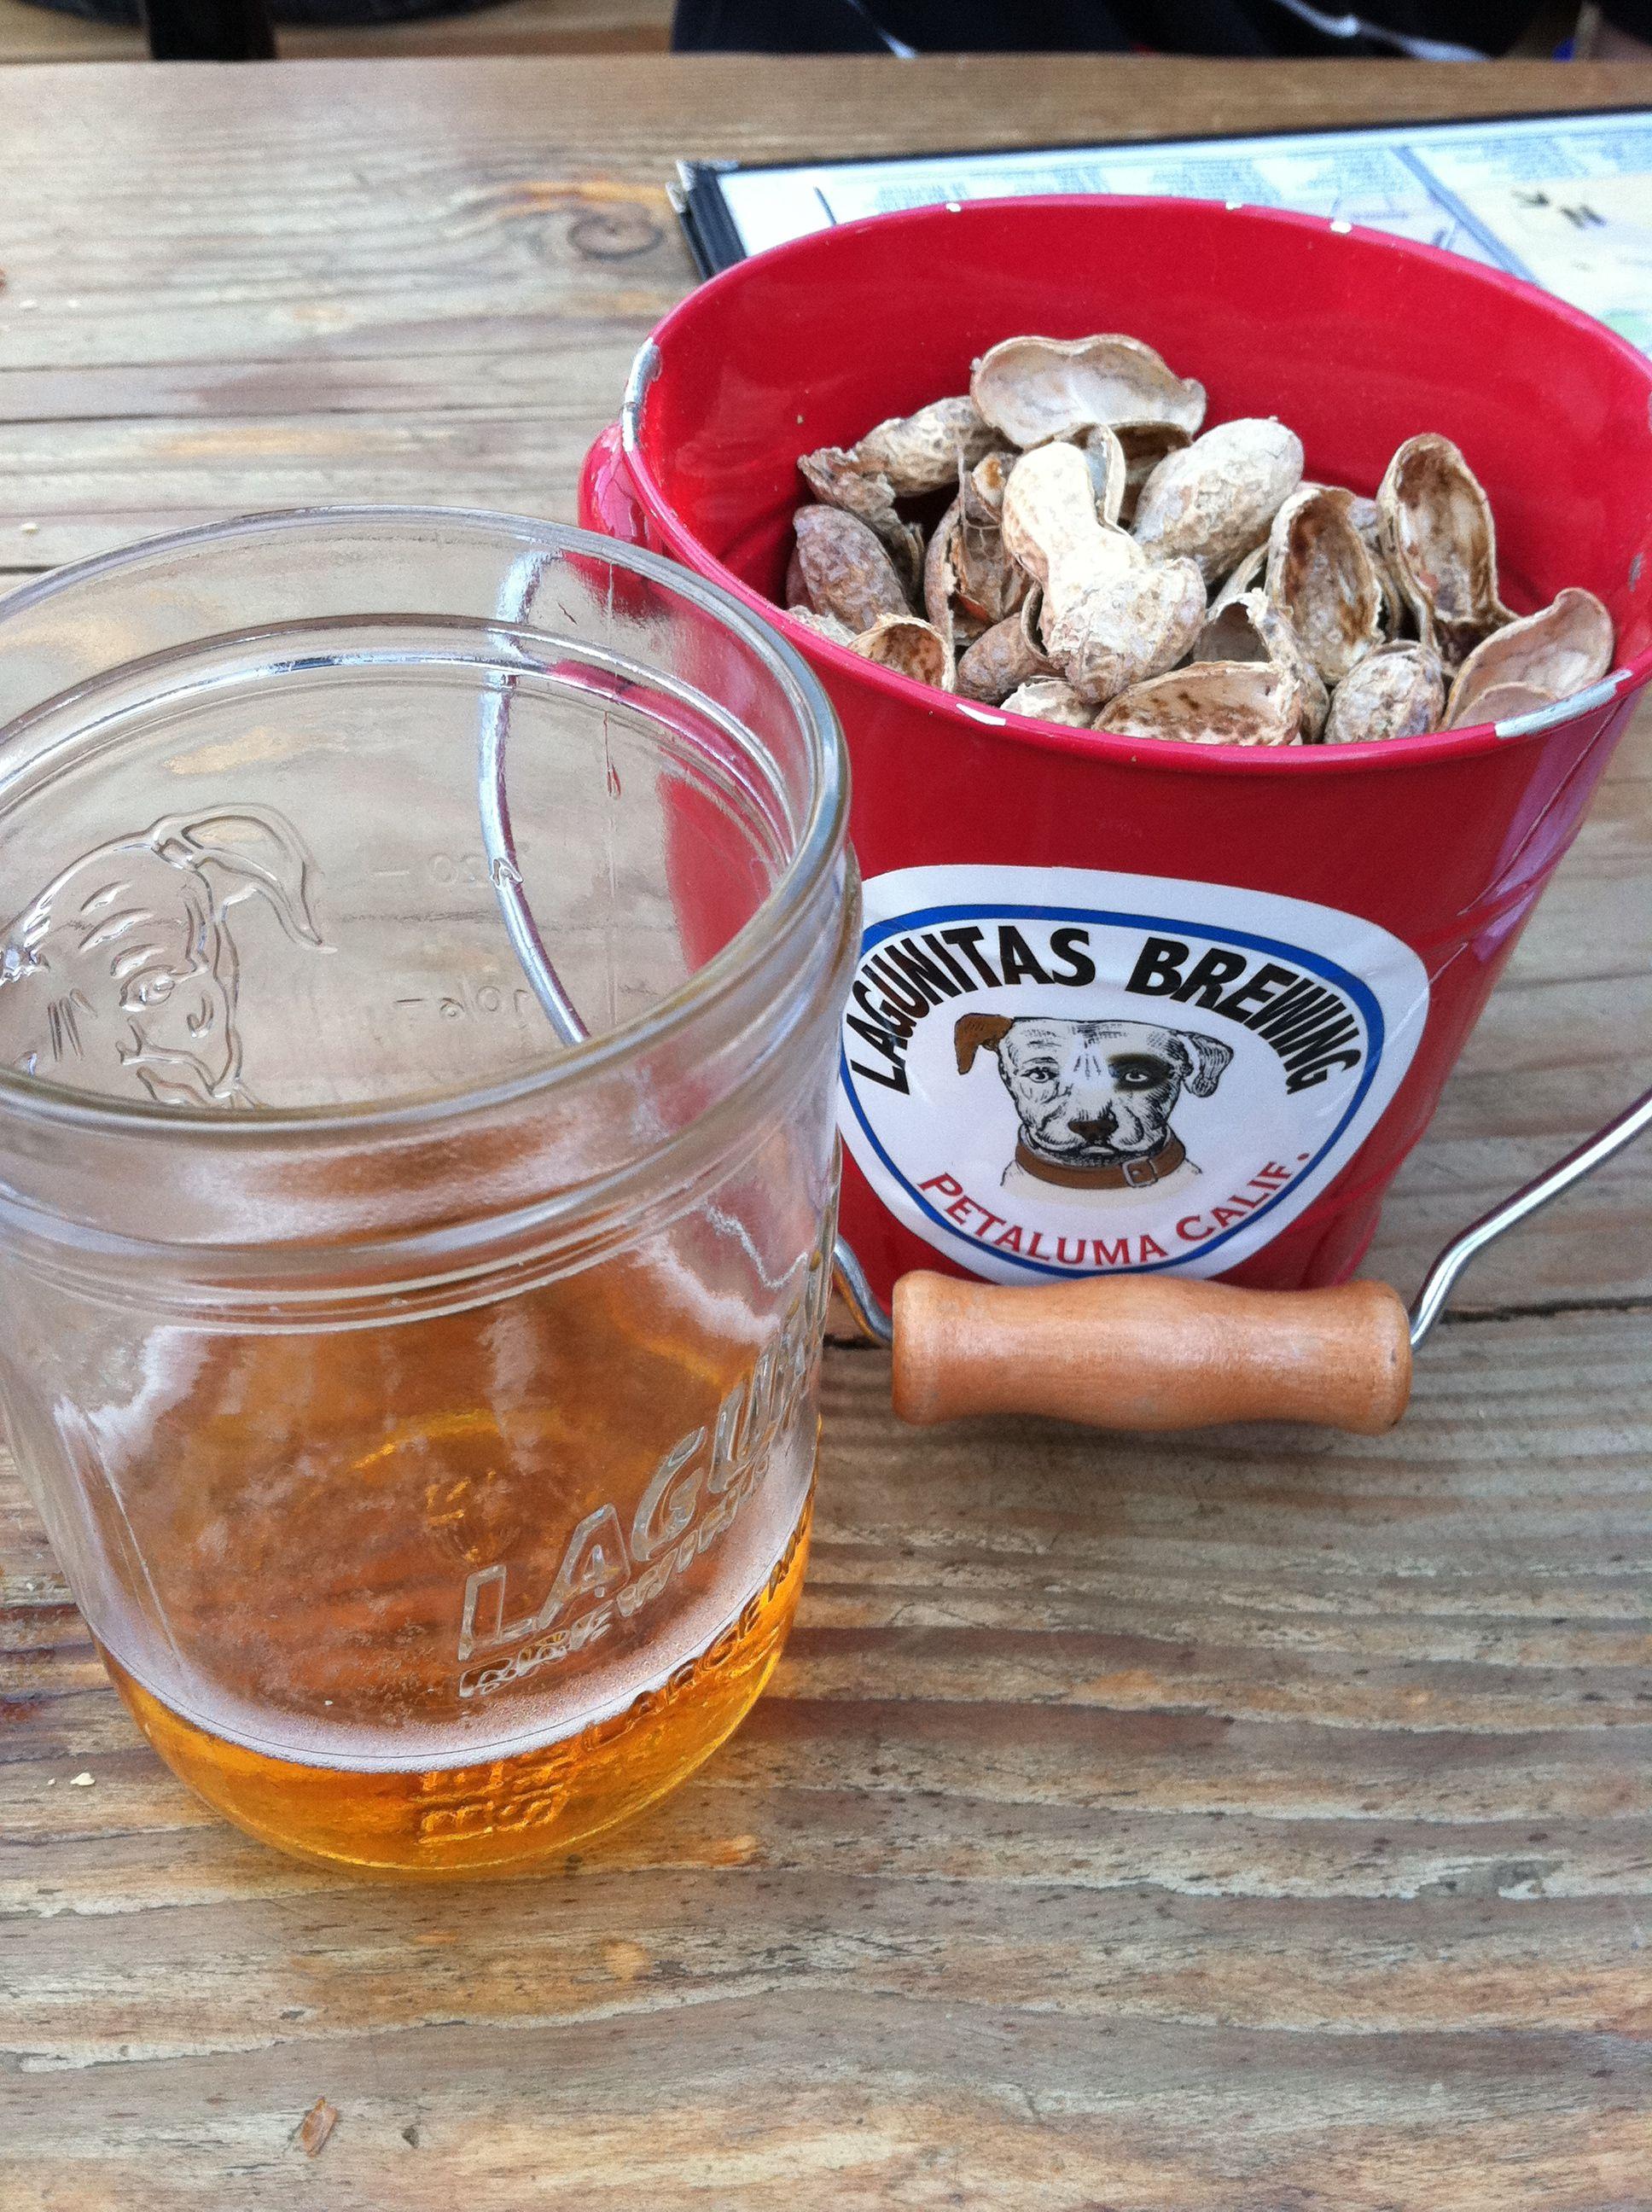 Double yum beer and peanuts at lagunitas brewery